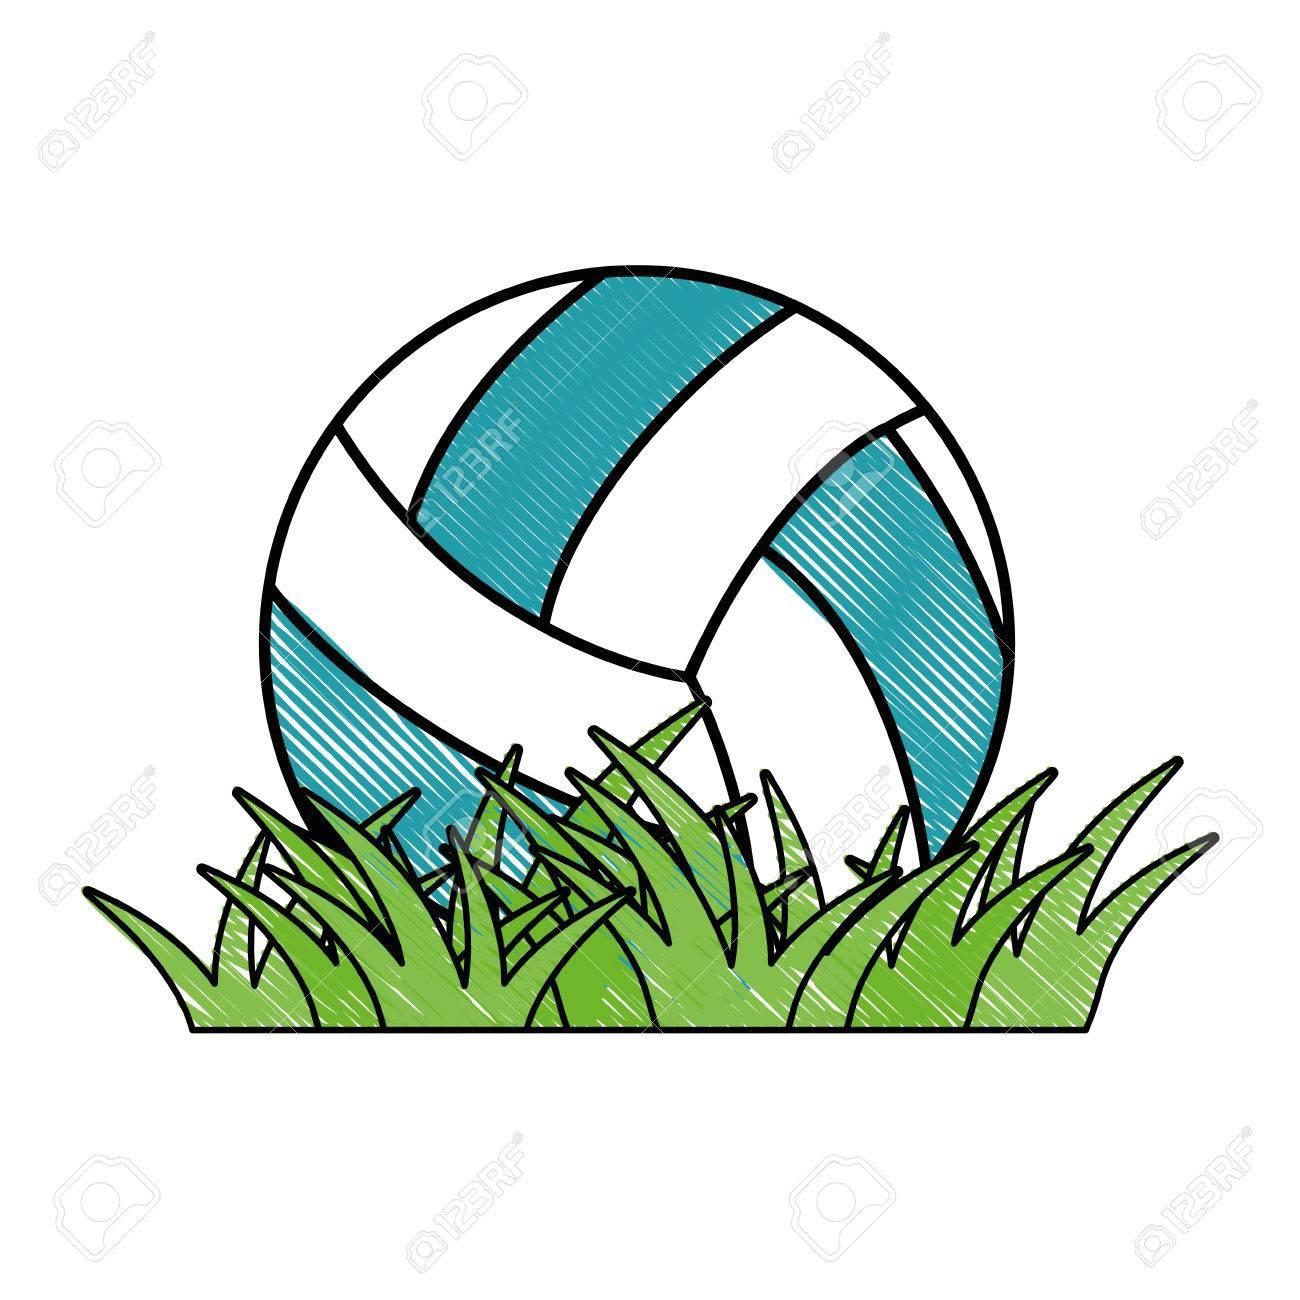 volleyball ball grass icon vector illustration graphic design rh 123rf com  volleyball graphic designs